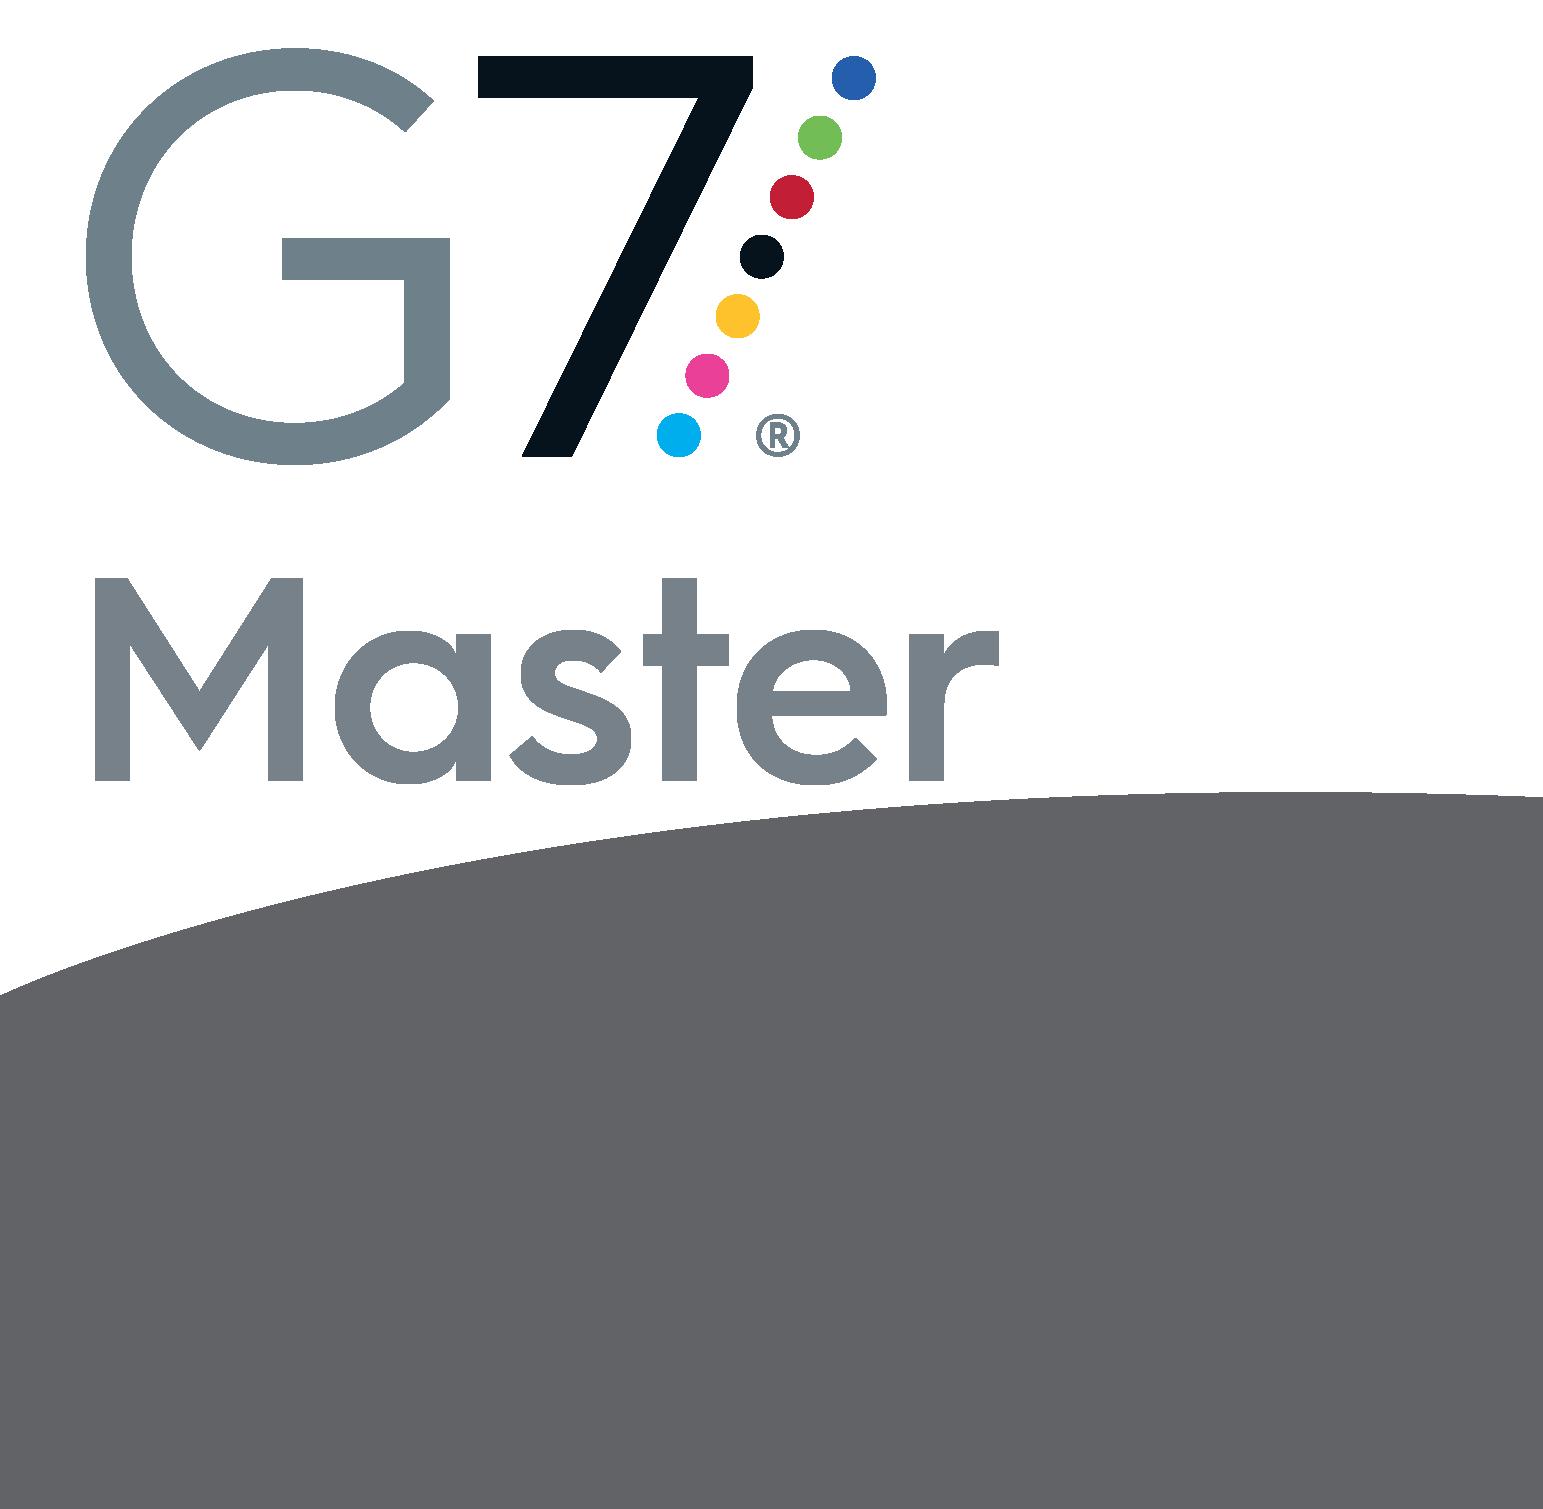 G7 Master banner logo L